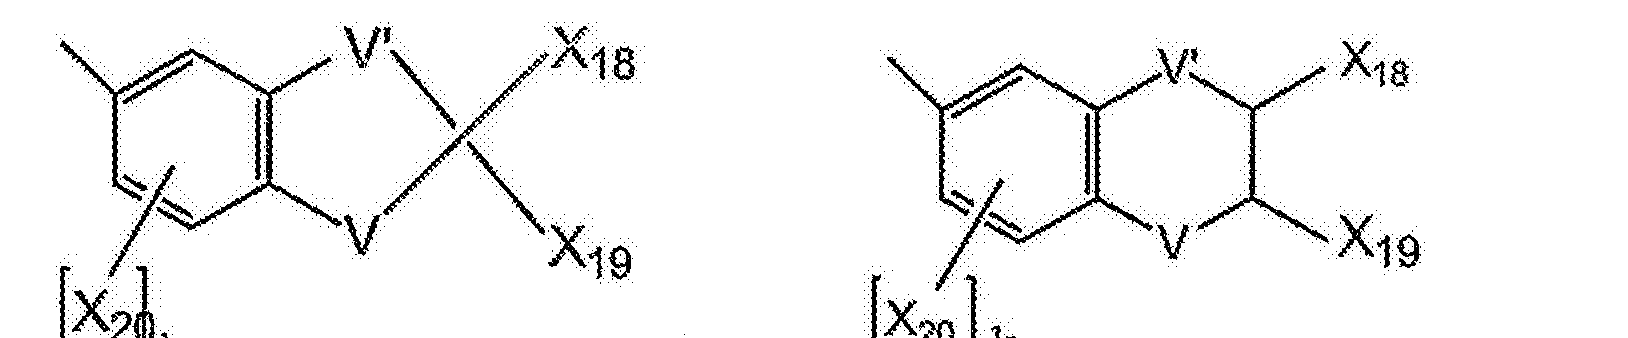 Figure CN105838349AD00162